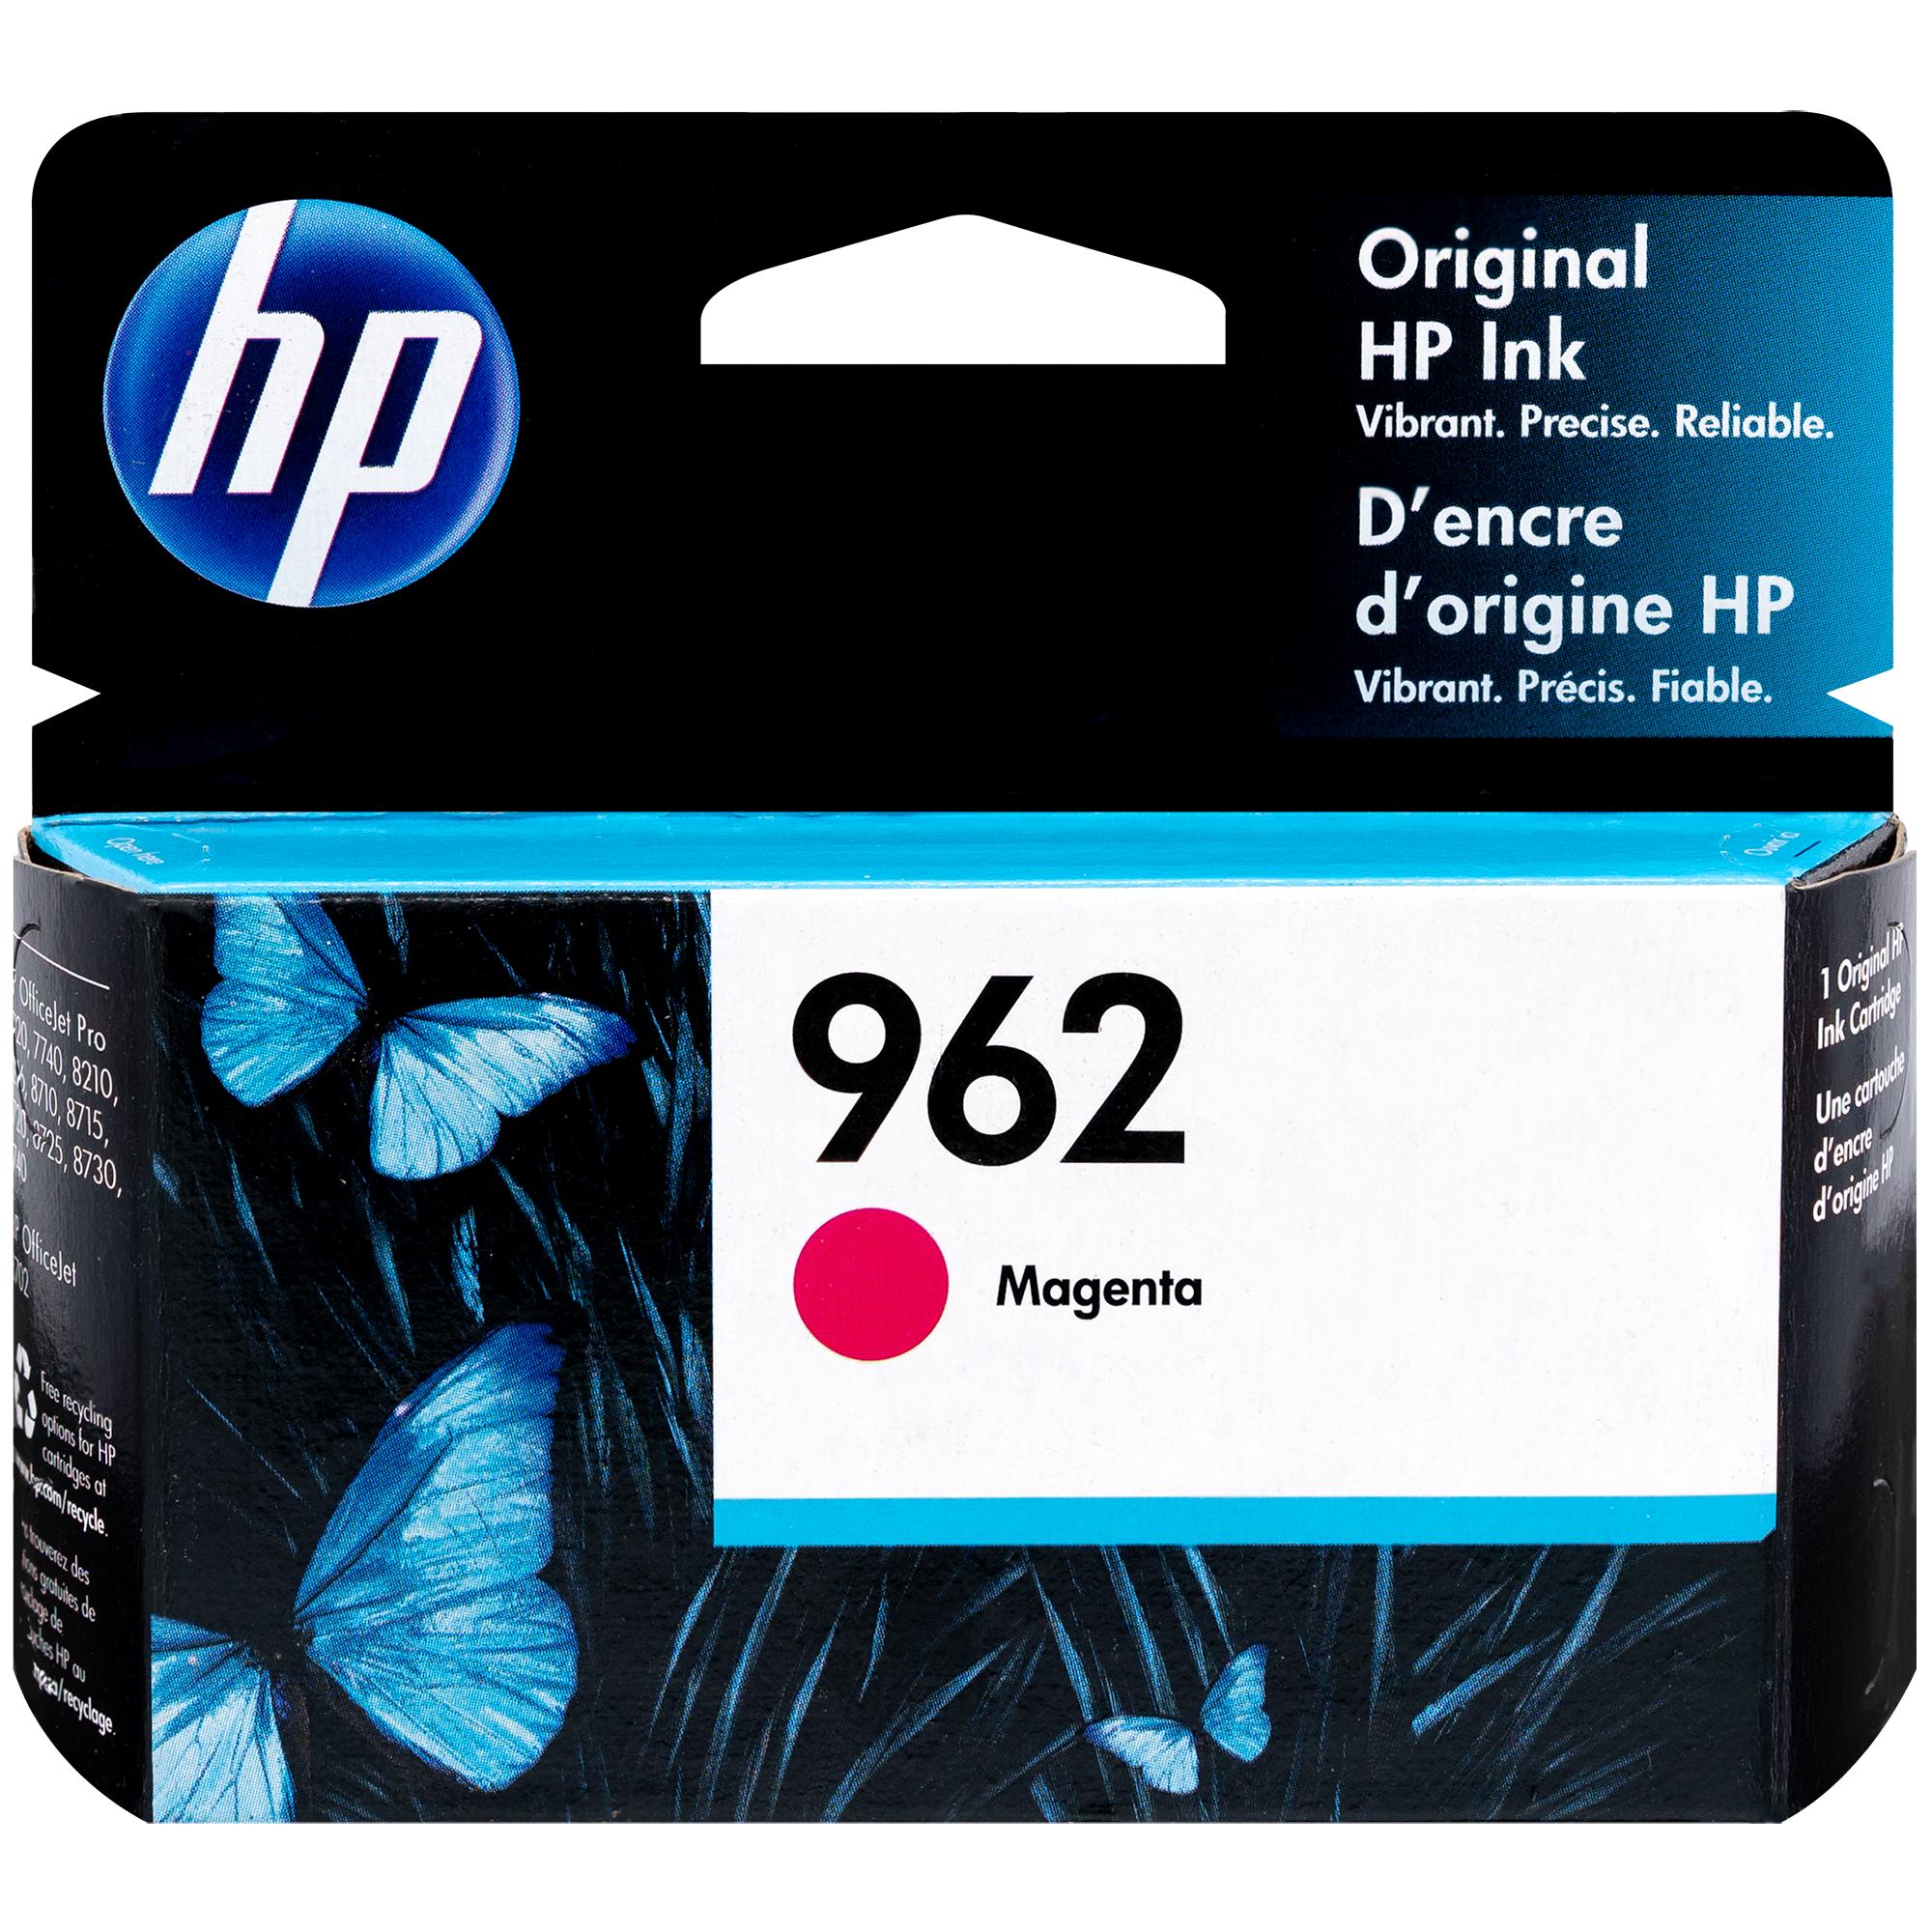 3HZ97AN   HP 962   Original HP Ink Cartridge - Magenta